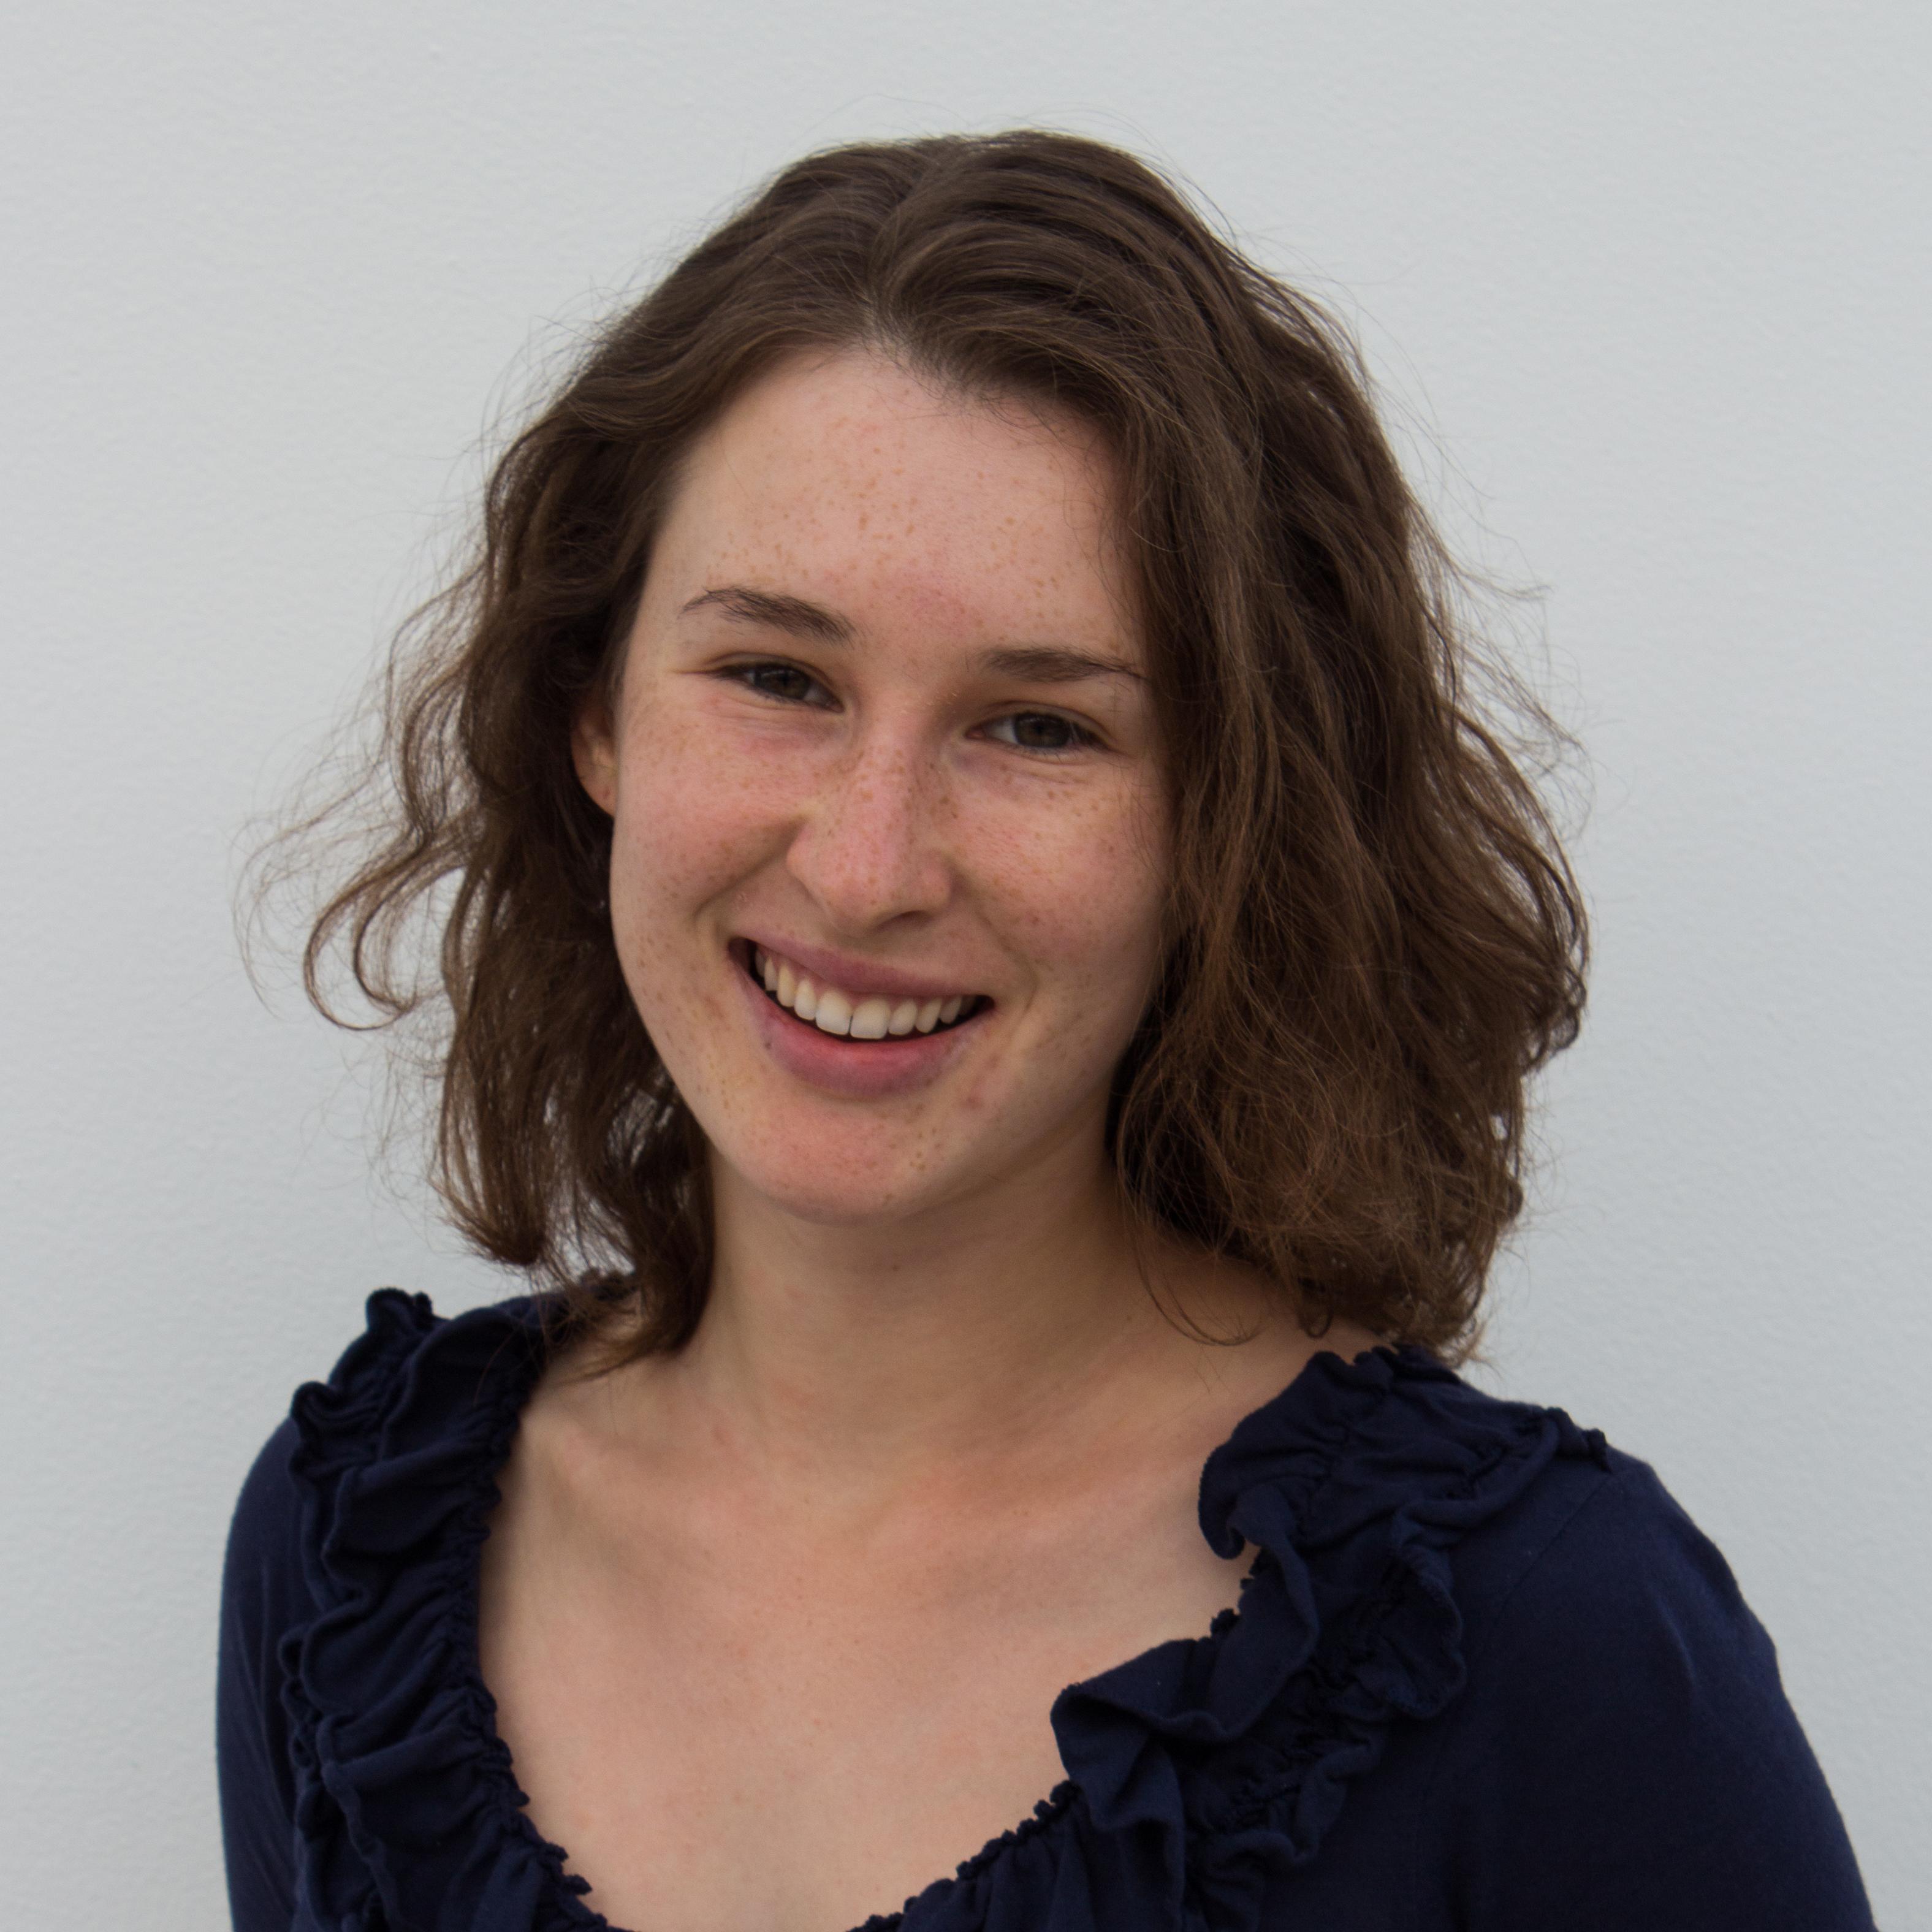 Elizabeth Modde